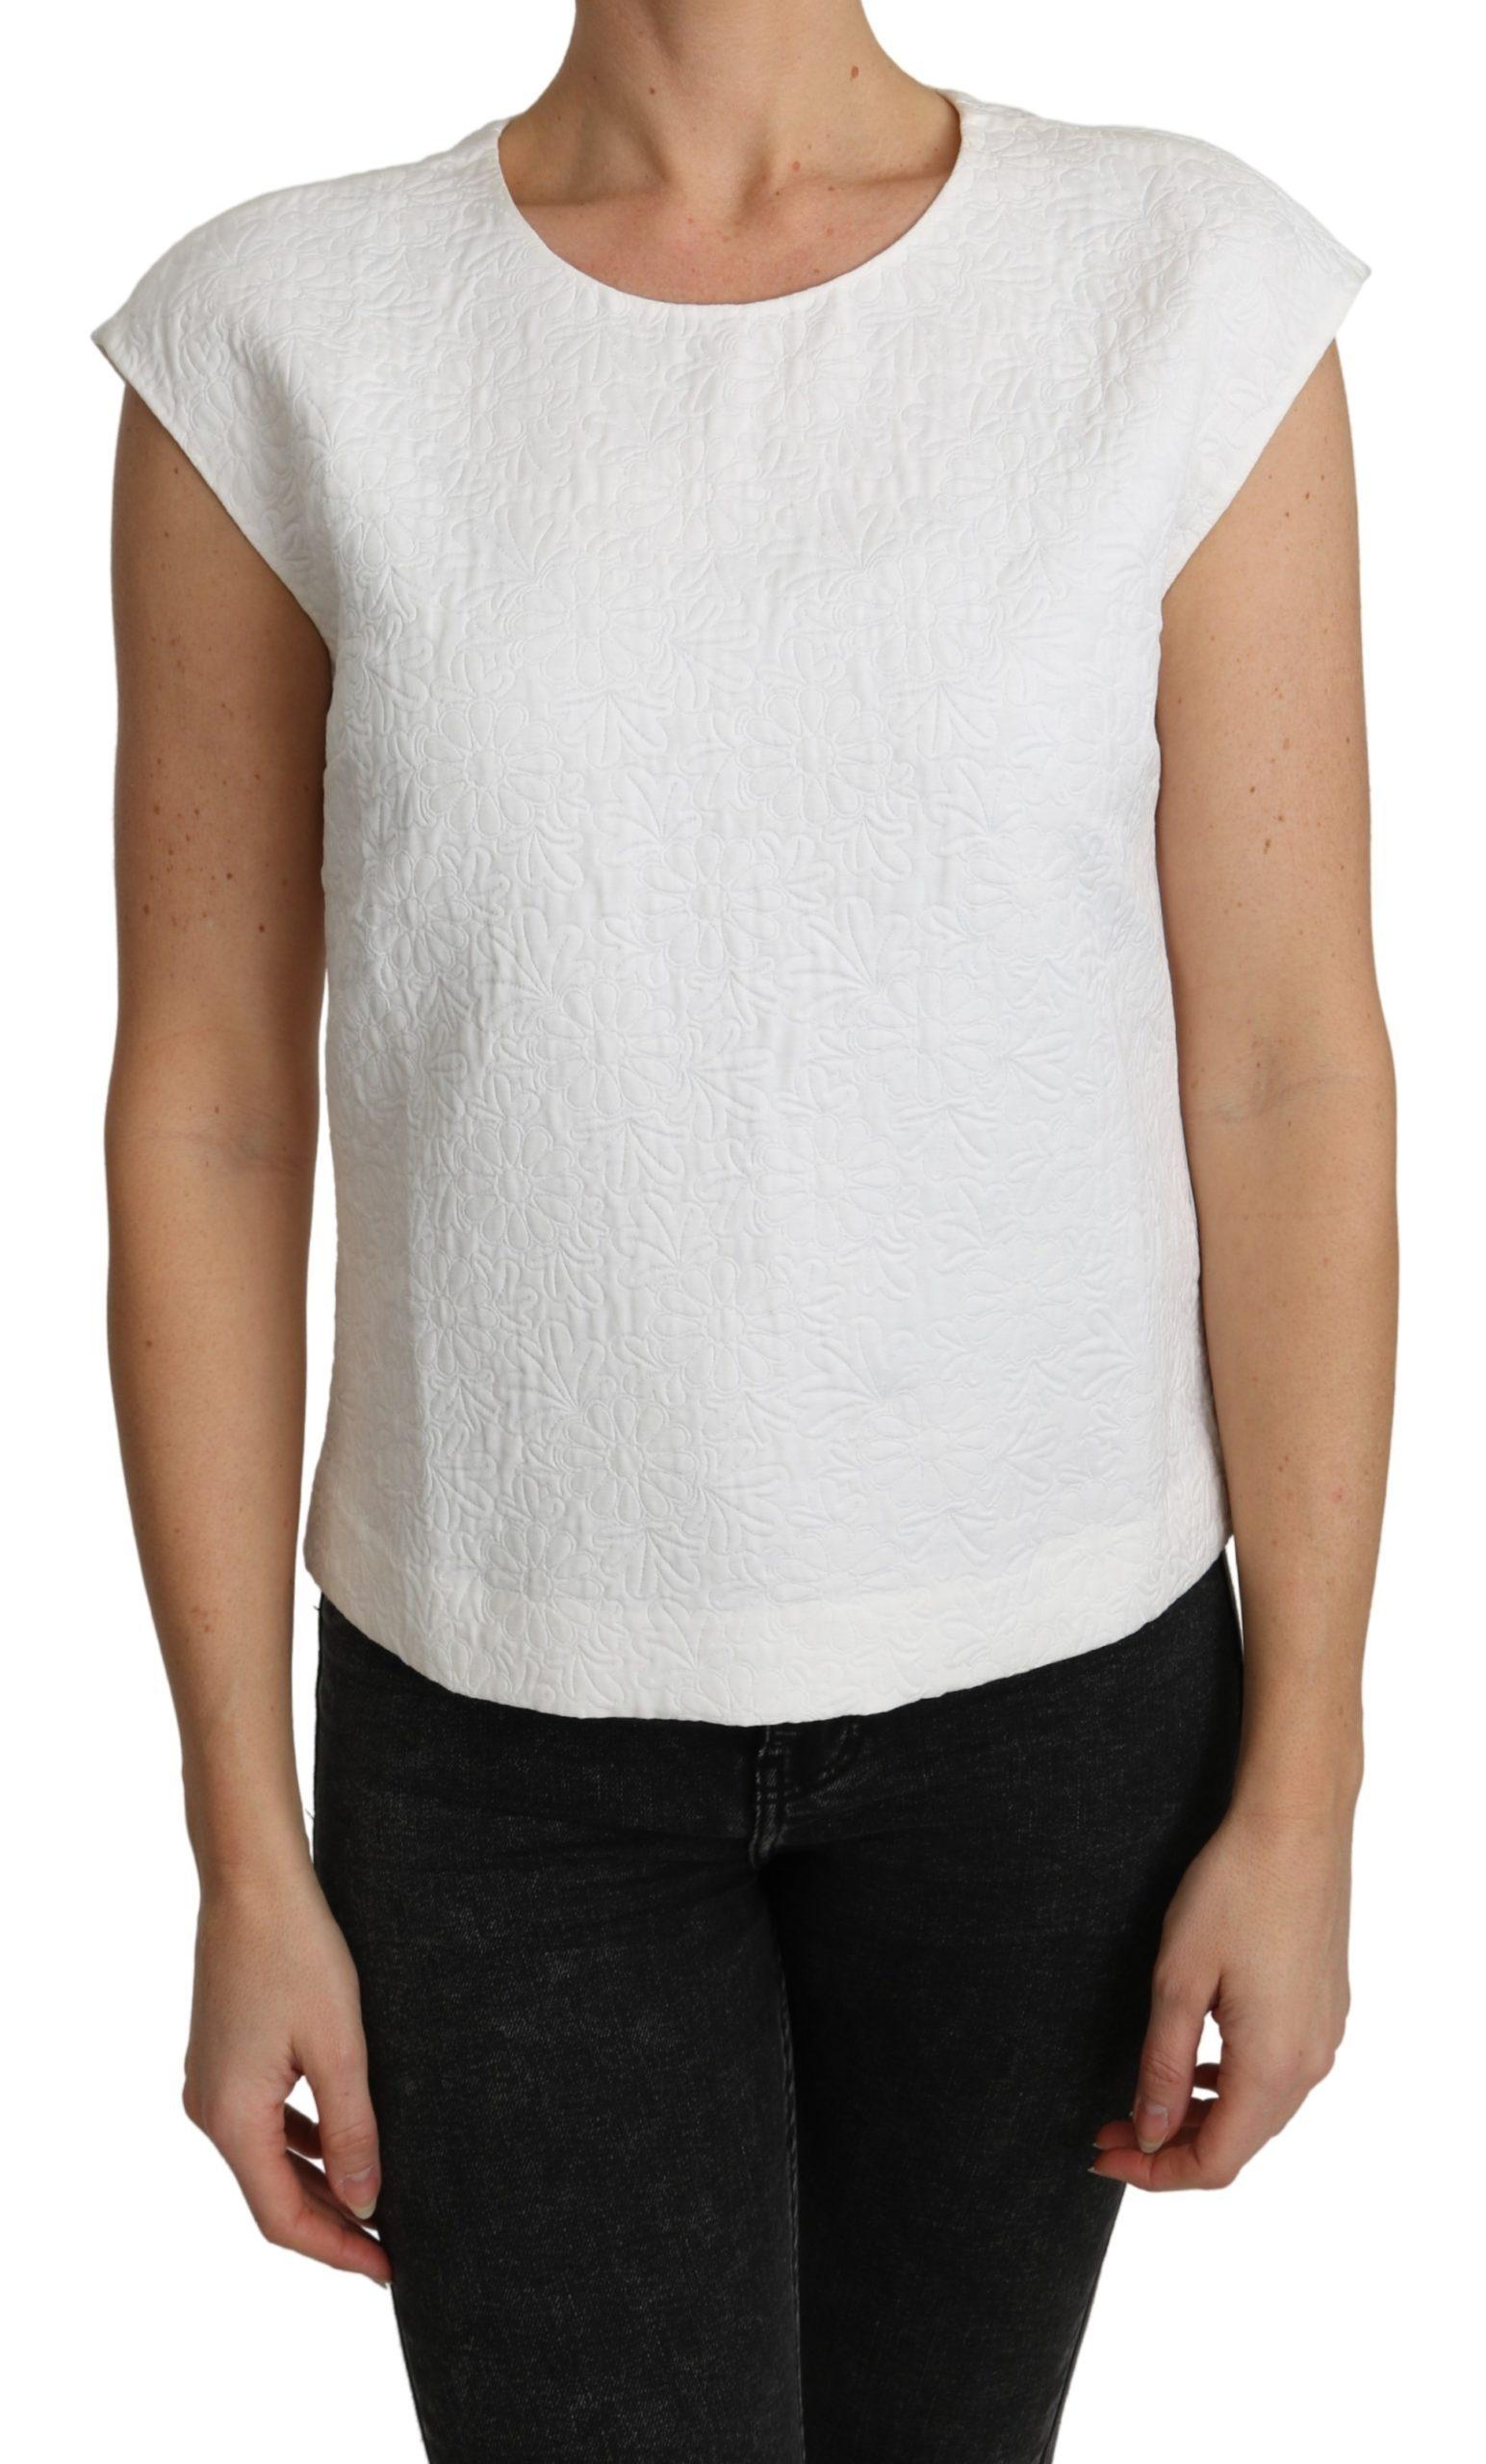 Dolce & Gabbana Women's Floral Brocade Top White TSH4840 - IT36 | XS